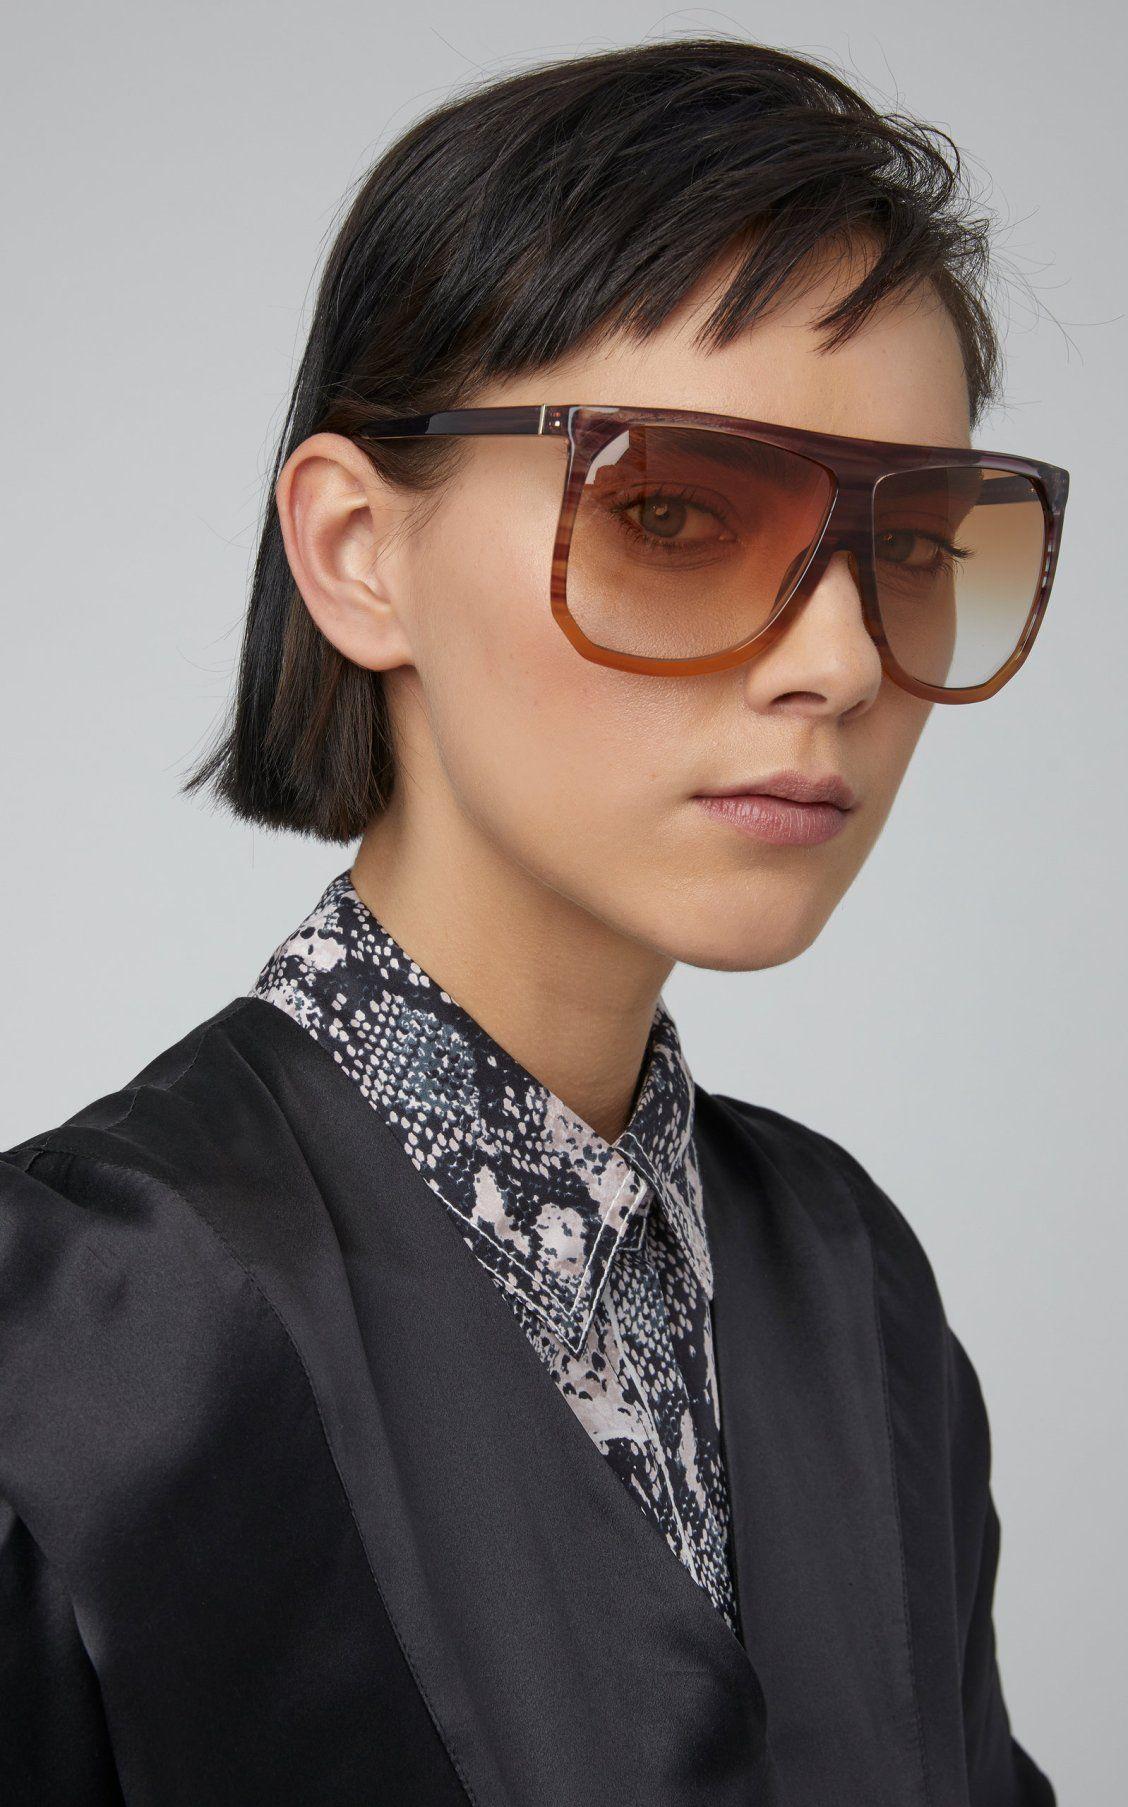 4b23c7edb2f9 Filipa Two-Tone Acetate Sunglasses by Loewe Sunglasses SS19 ...